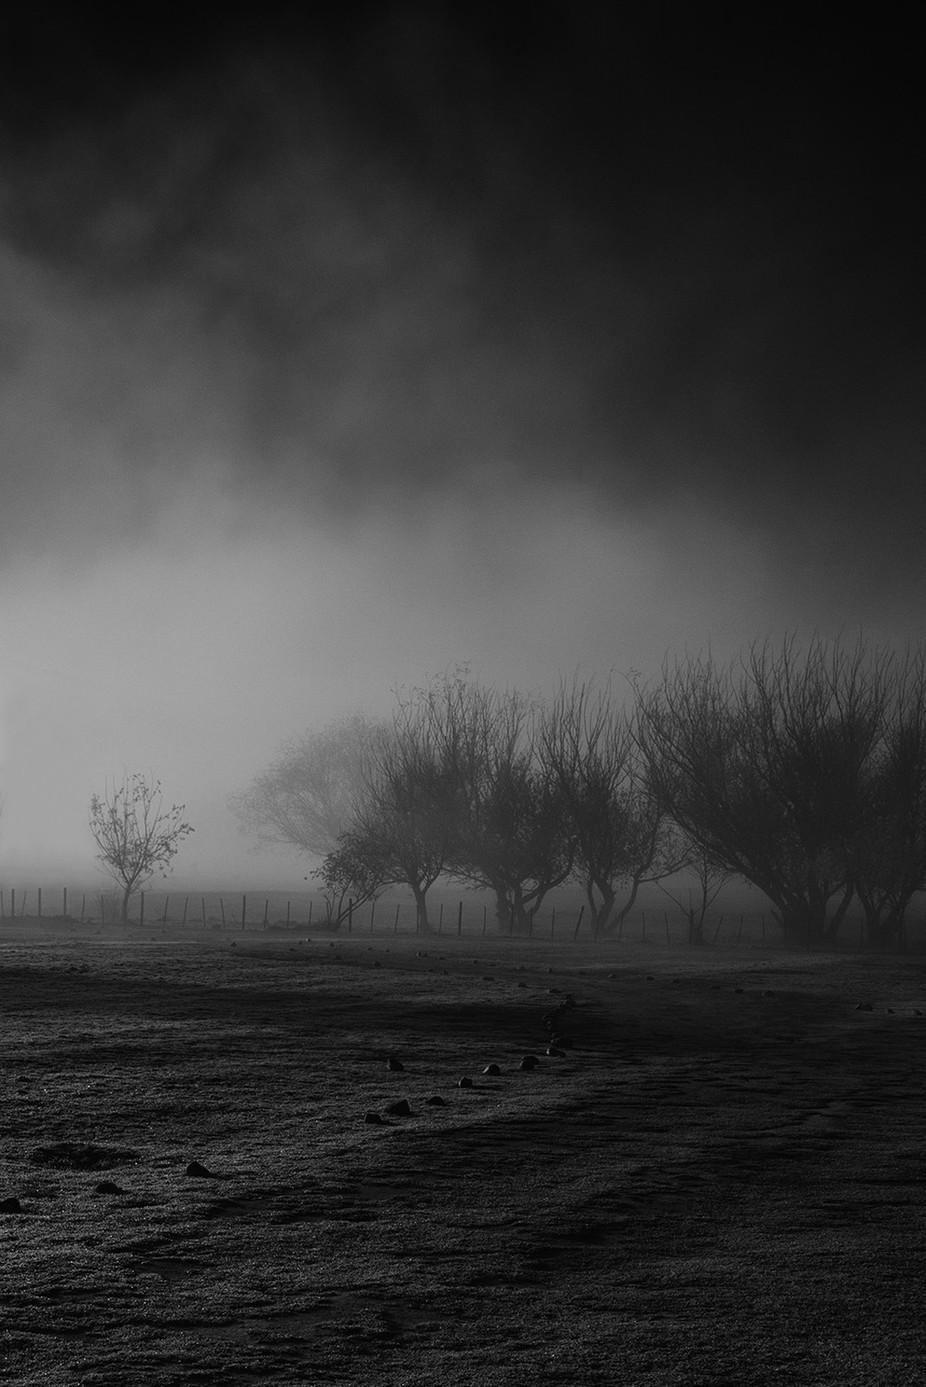 trees by vladimirchuyko - Tree Silhouettes Photo Contest